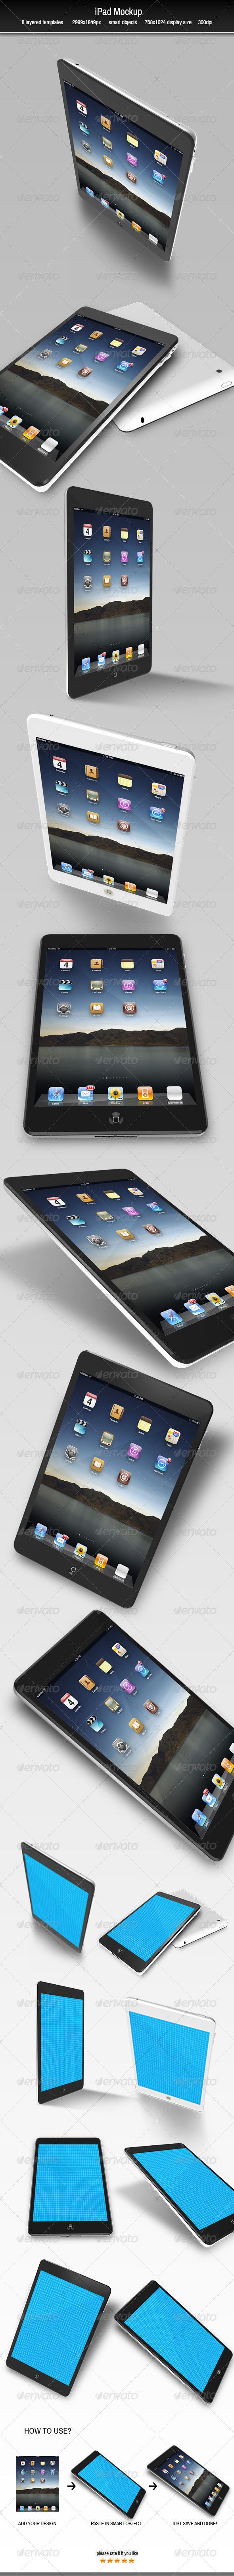 GraphicRiver iPad Mockup 7493463